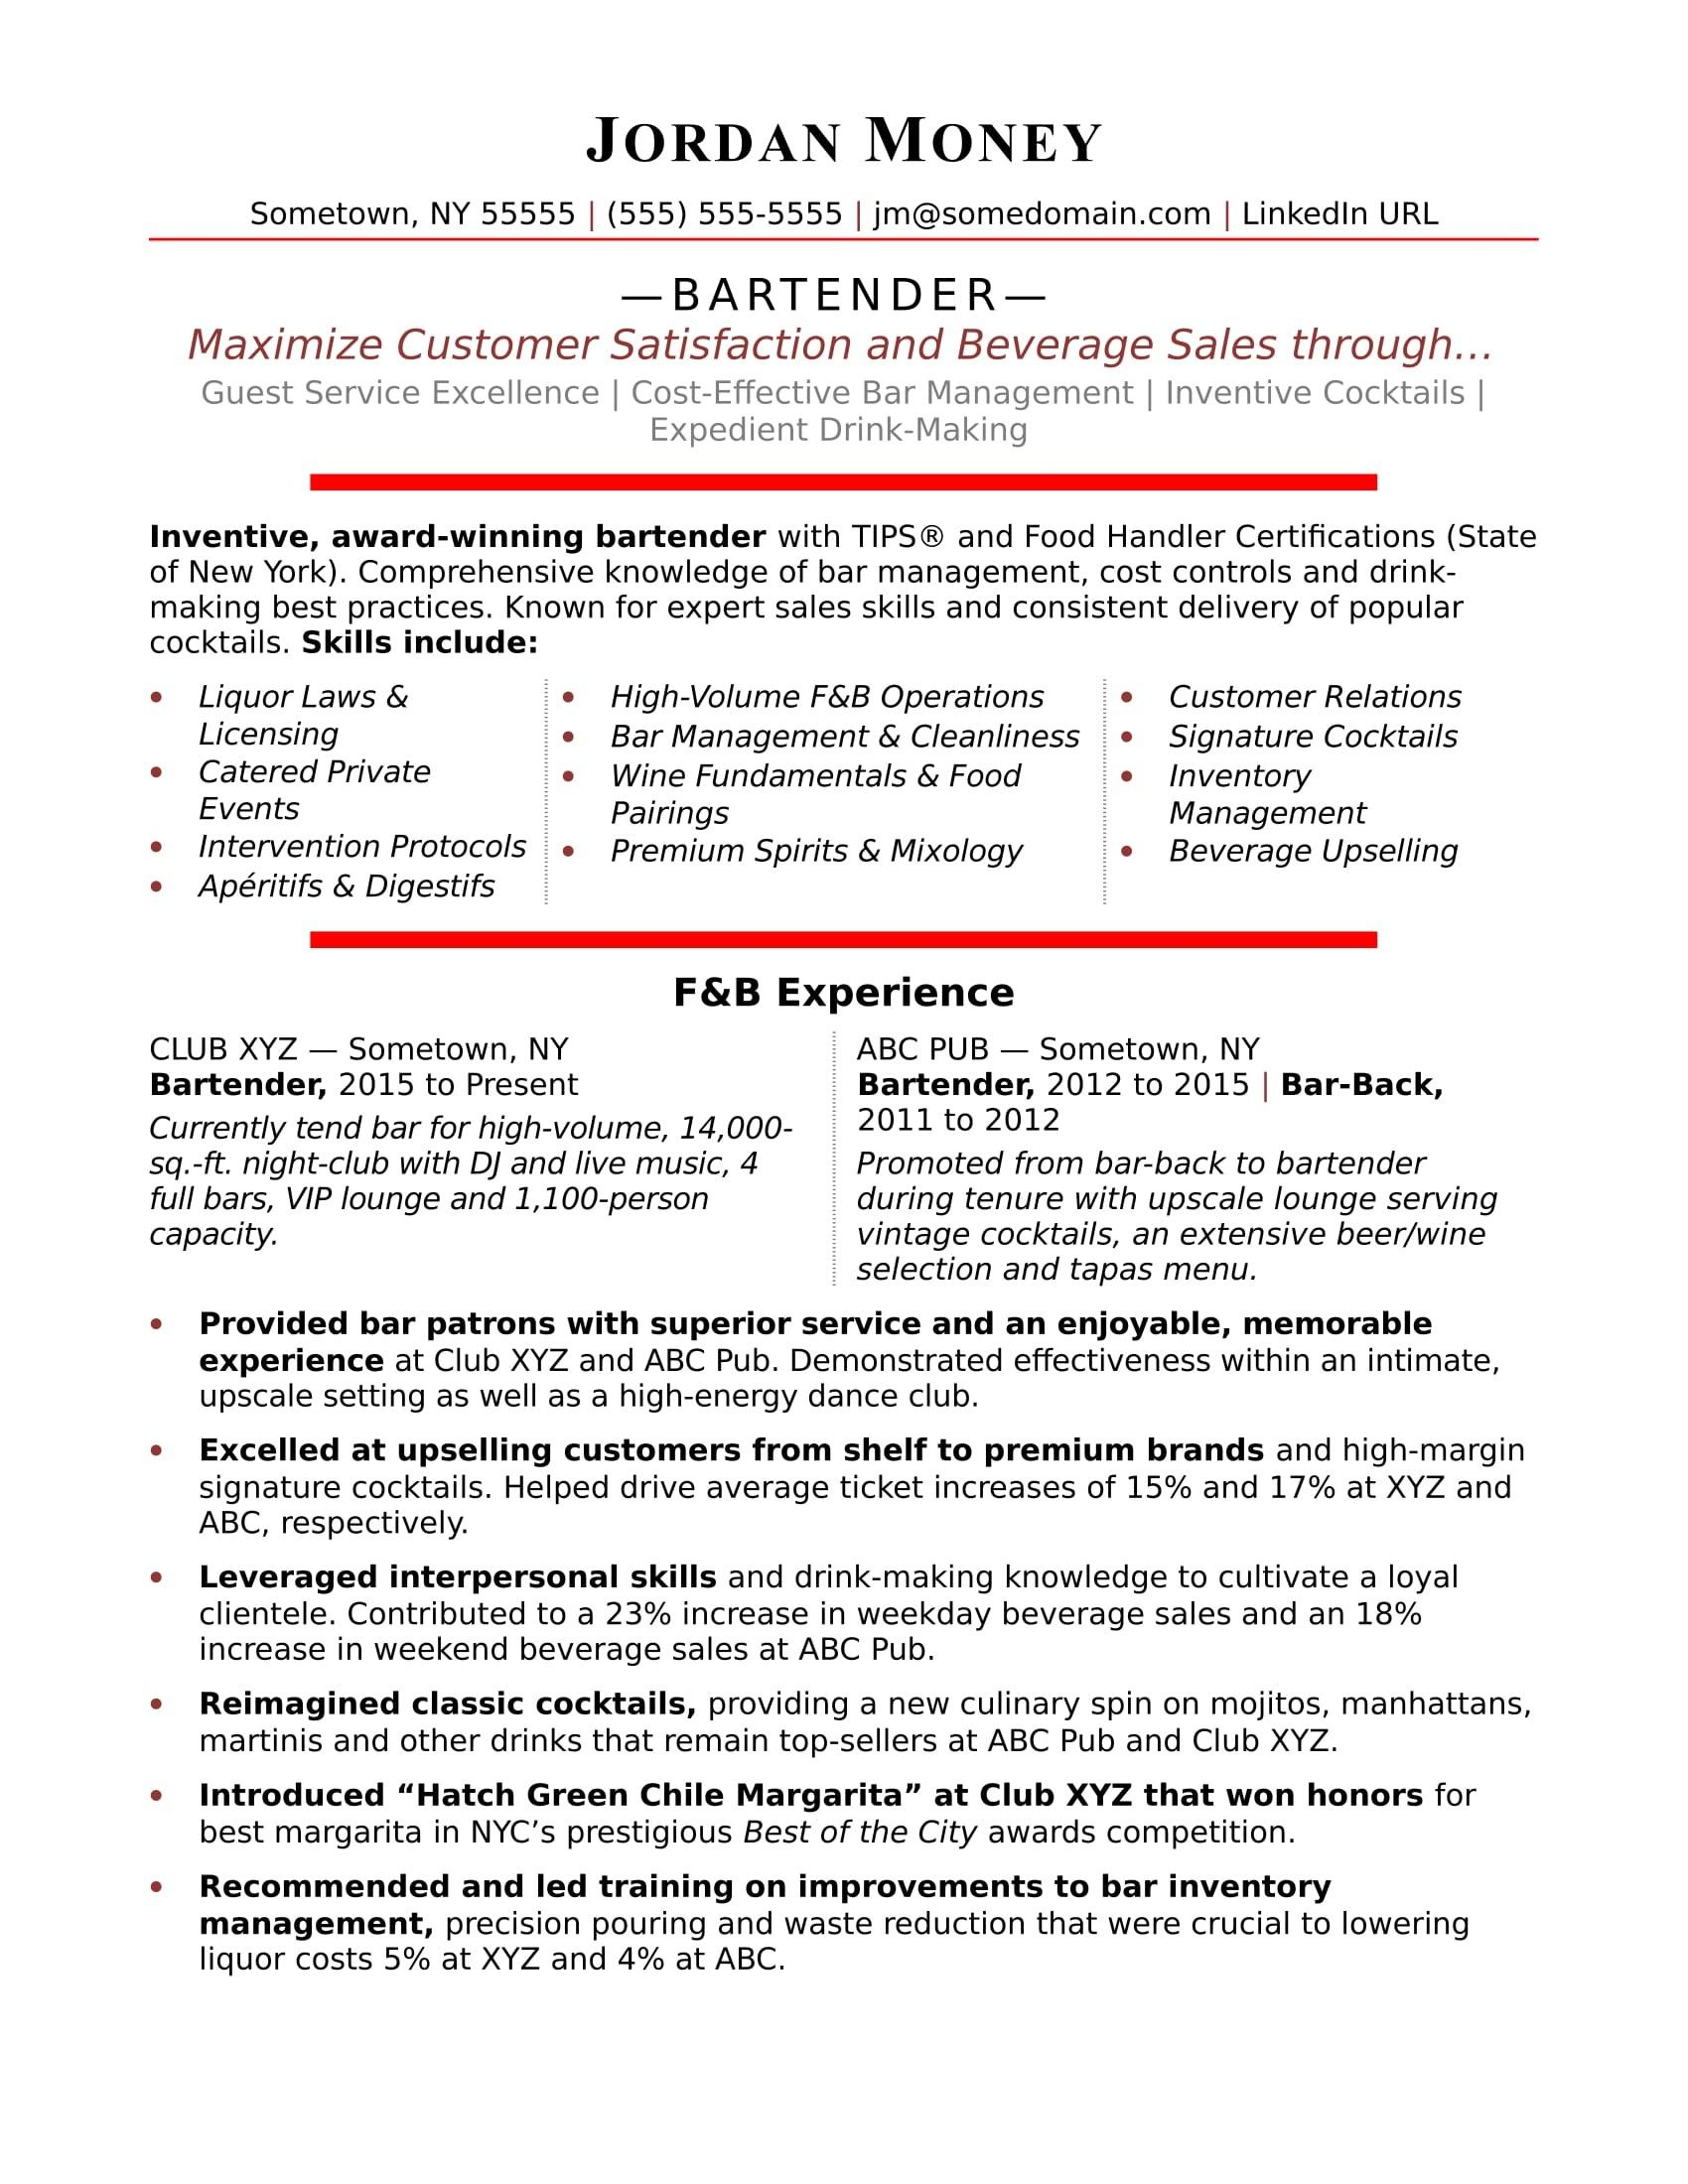 Polaris Office 5 Resume Templates #office #polaris #resume #ResumeTemplates  #templates